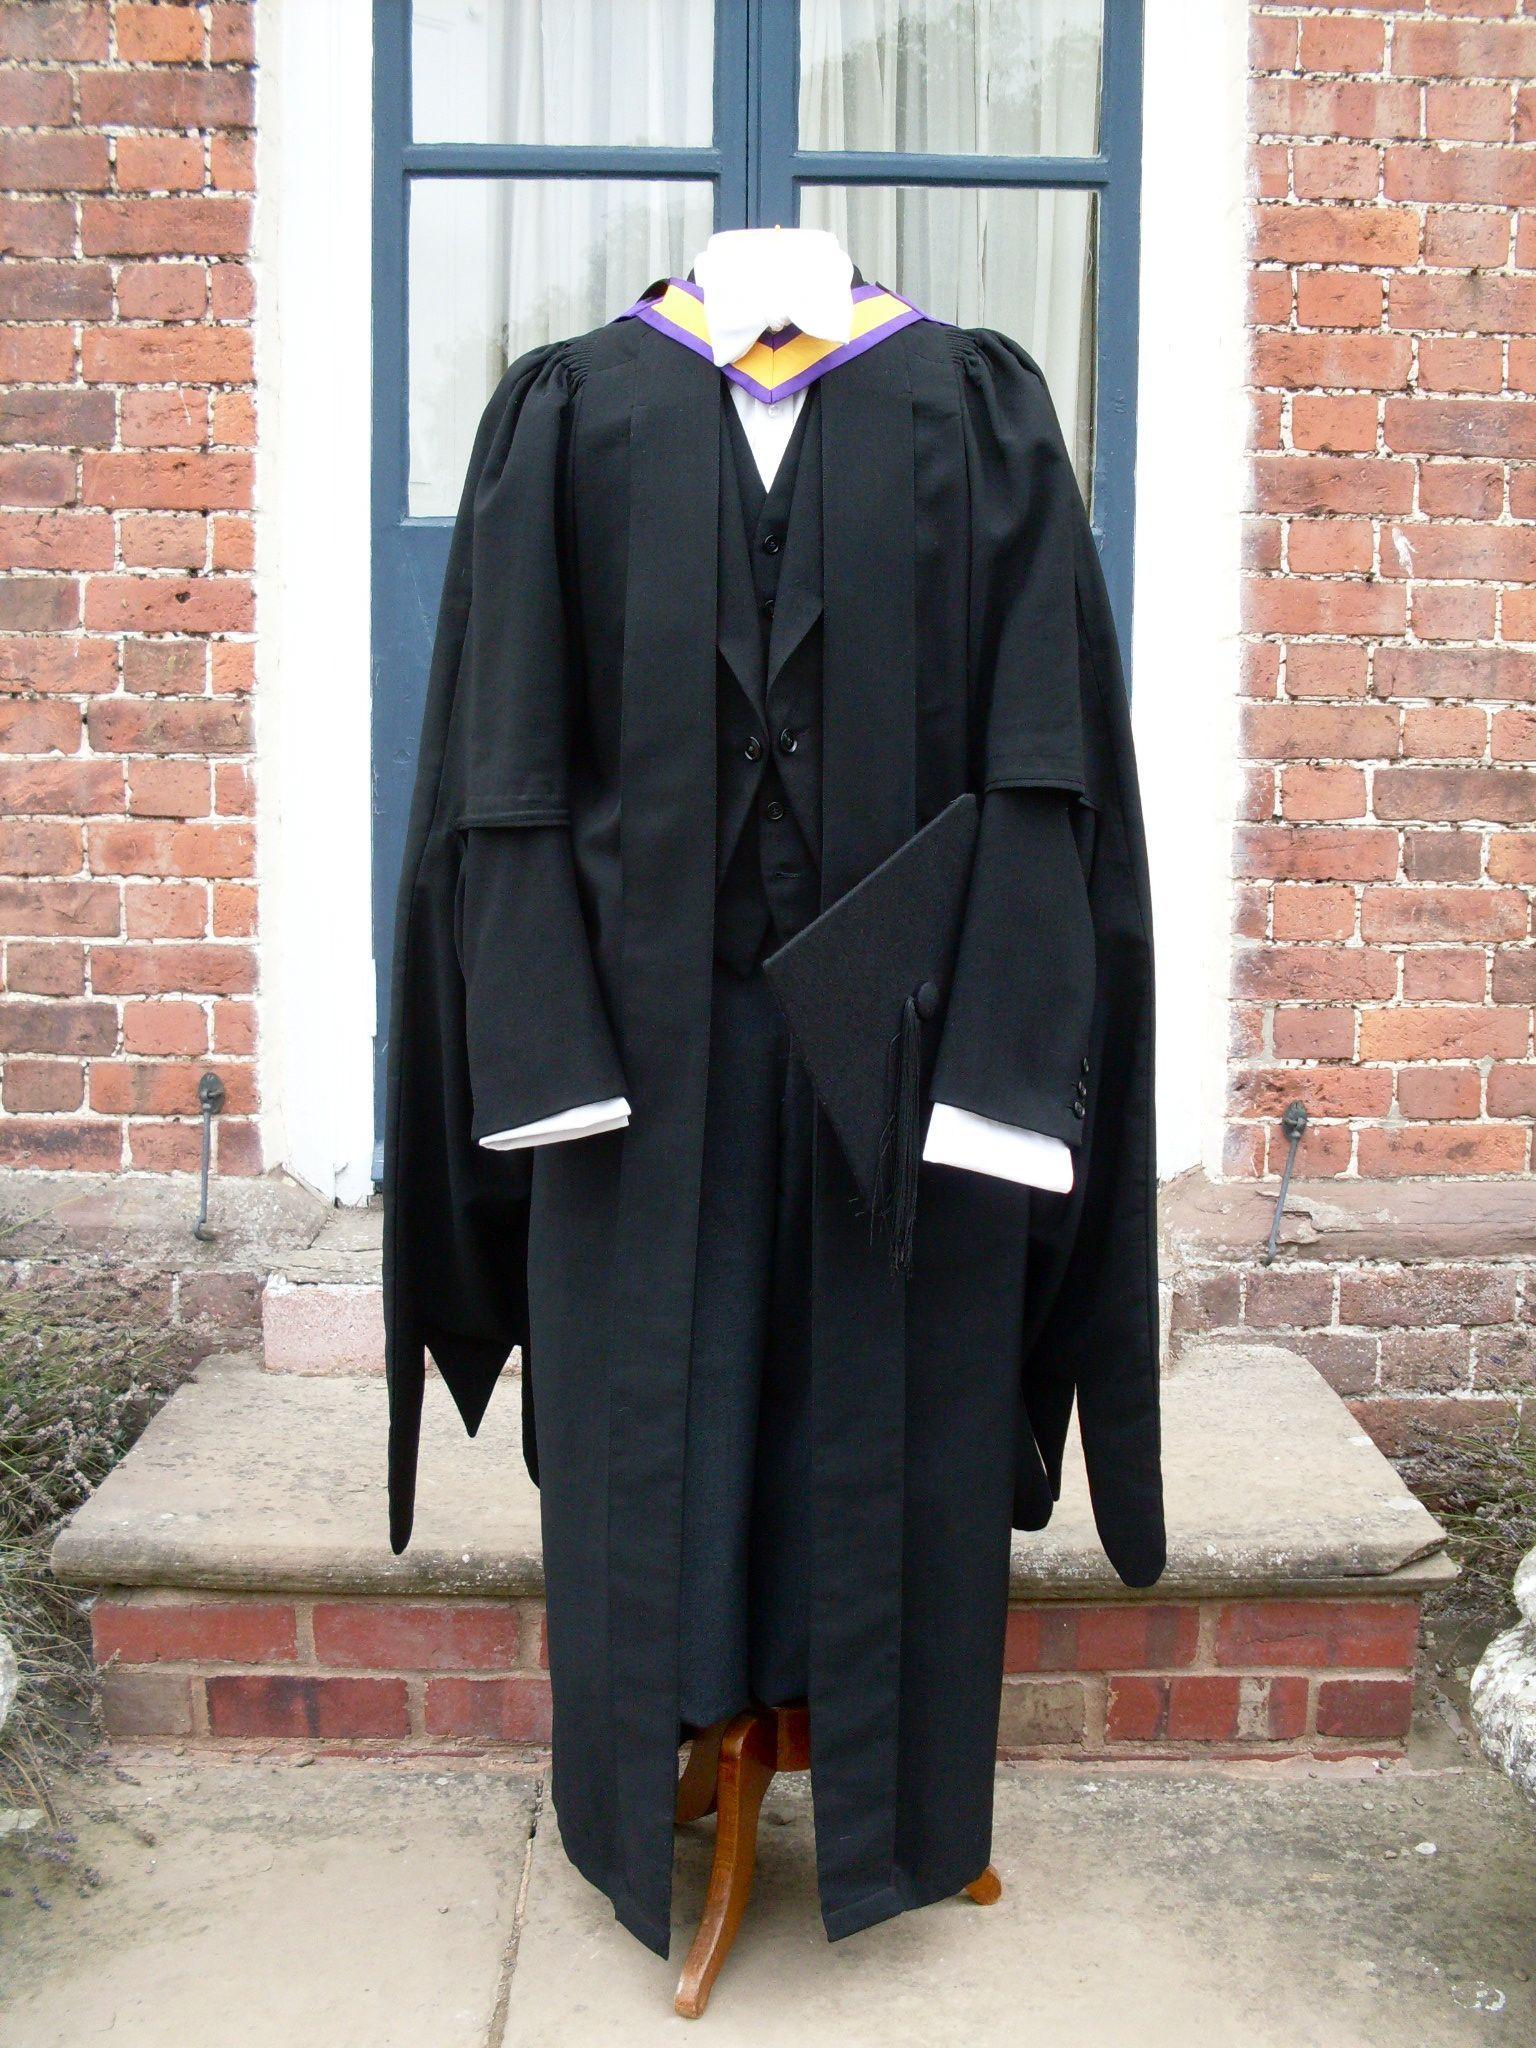 Ede And Ravenscroft What To Wear Under Graduation Gown | Daltononderzoek